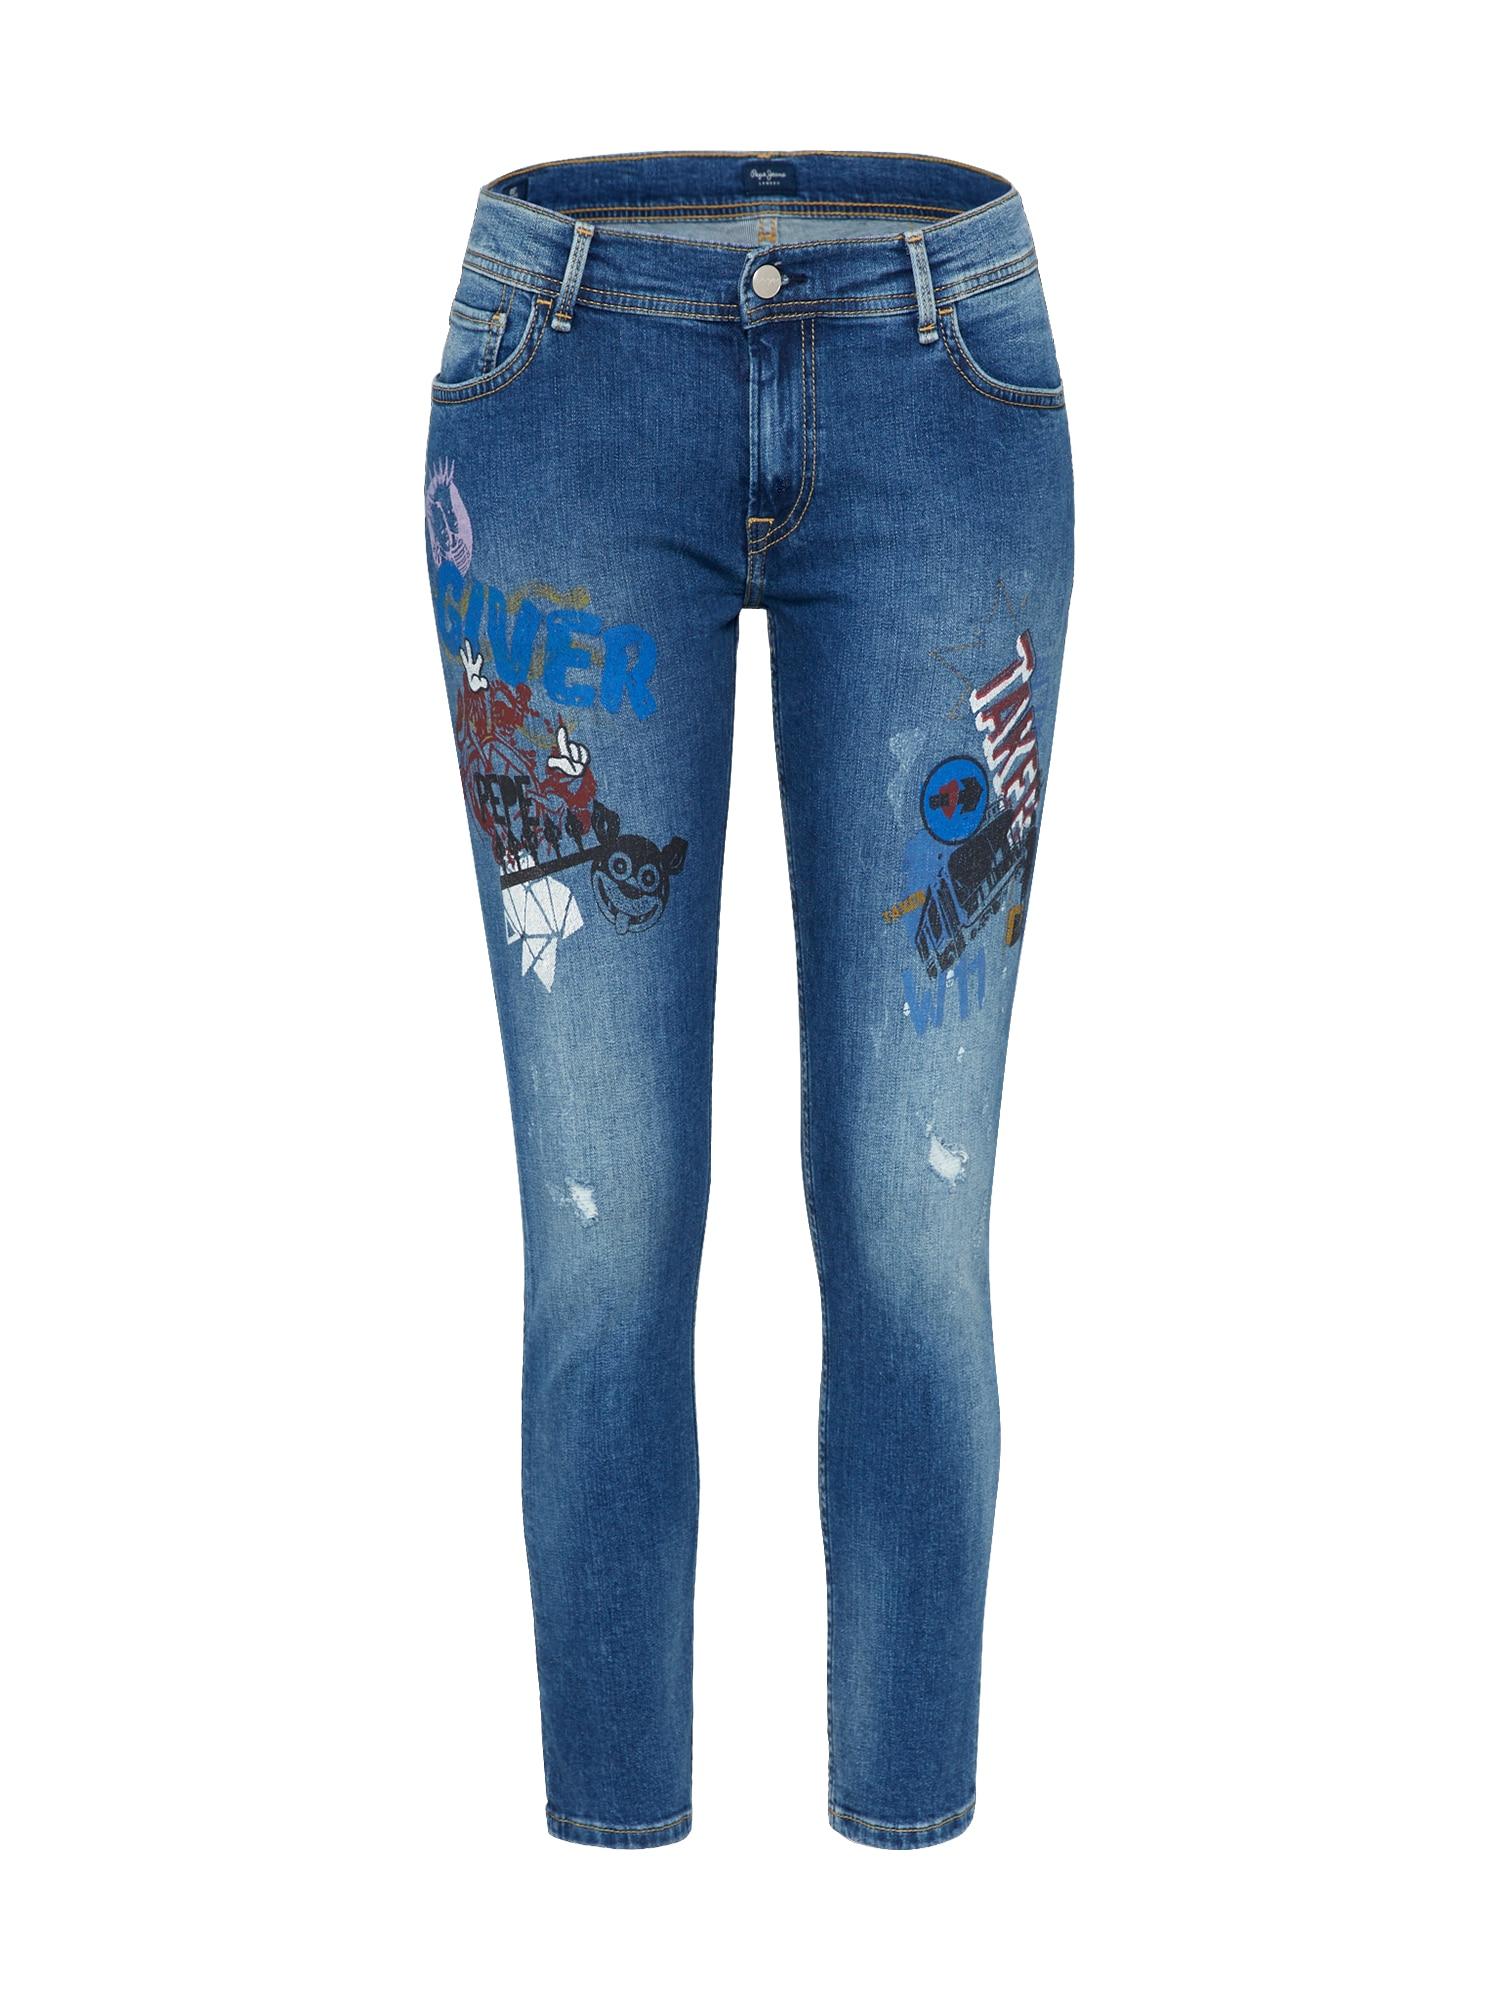 Pepe Jeans Dames Jeans JOEY CARTOON blue denim